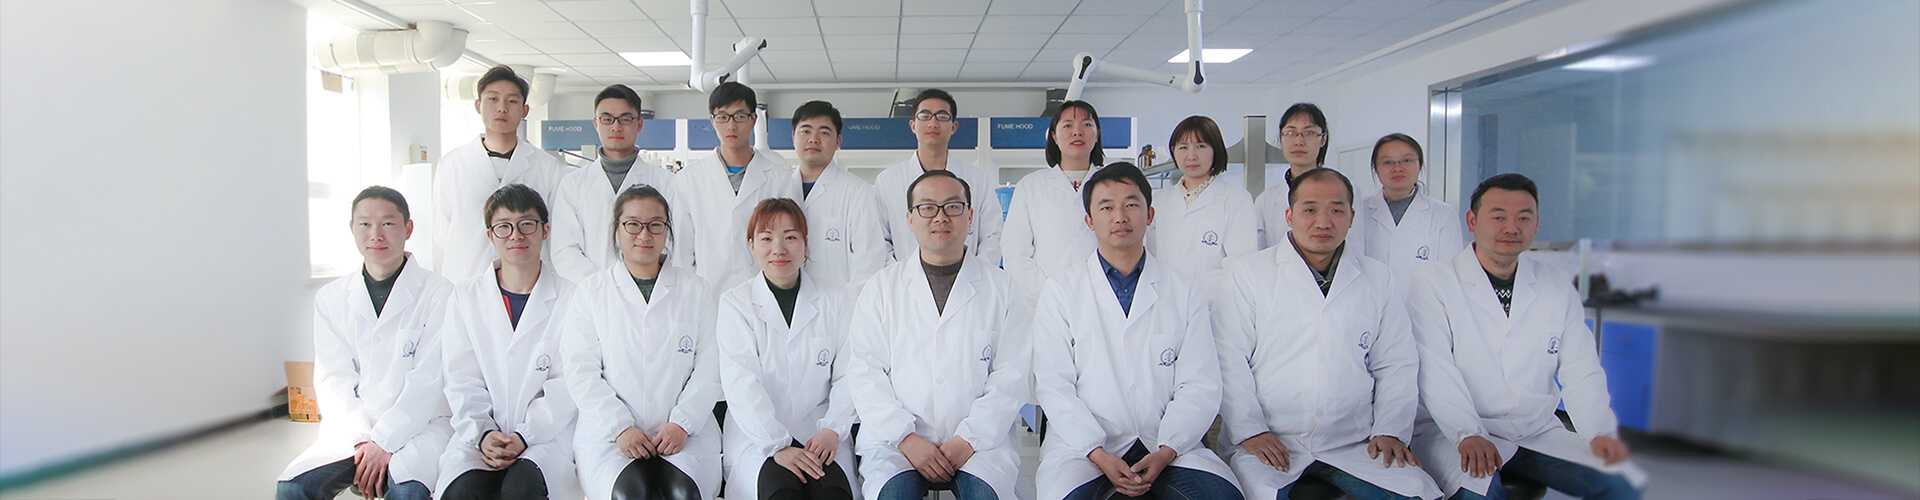 标准物质-www.bzwz.com国家标准物质网-标准物质